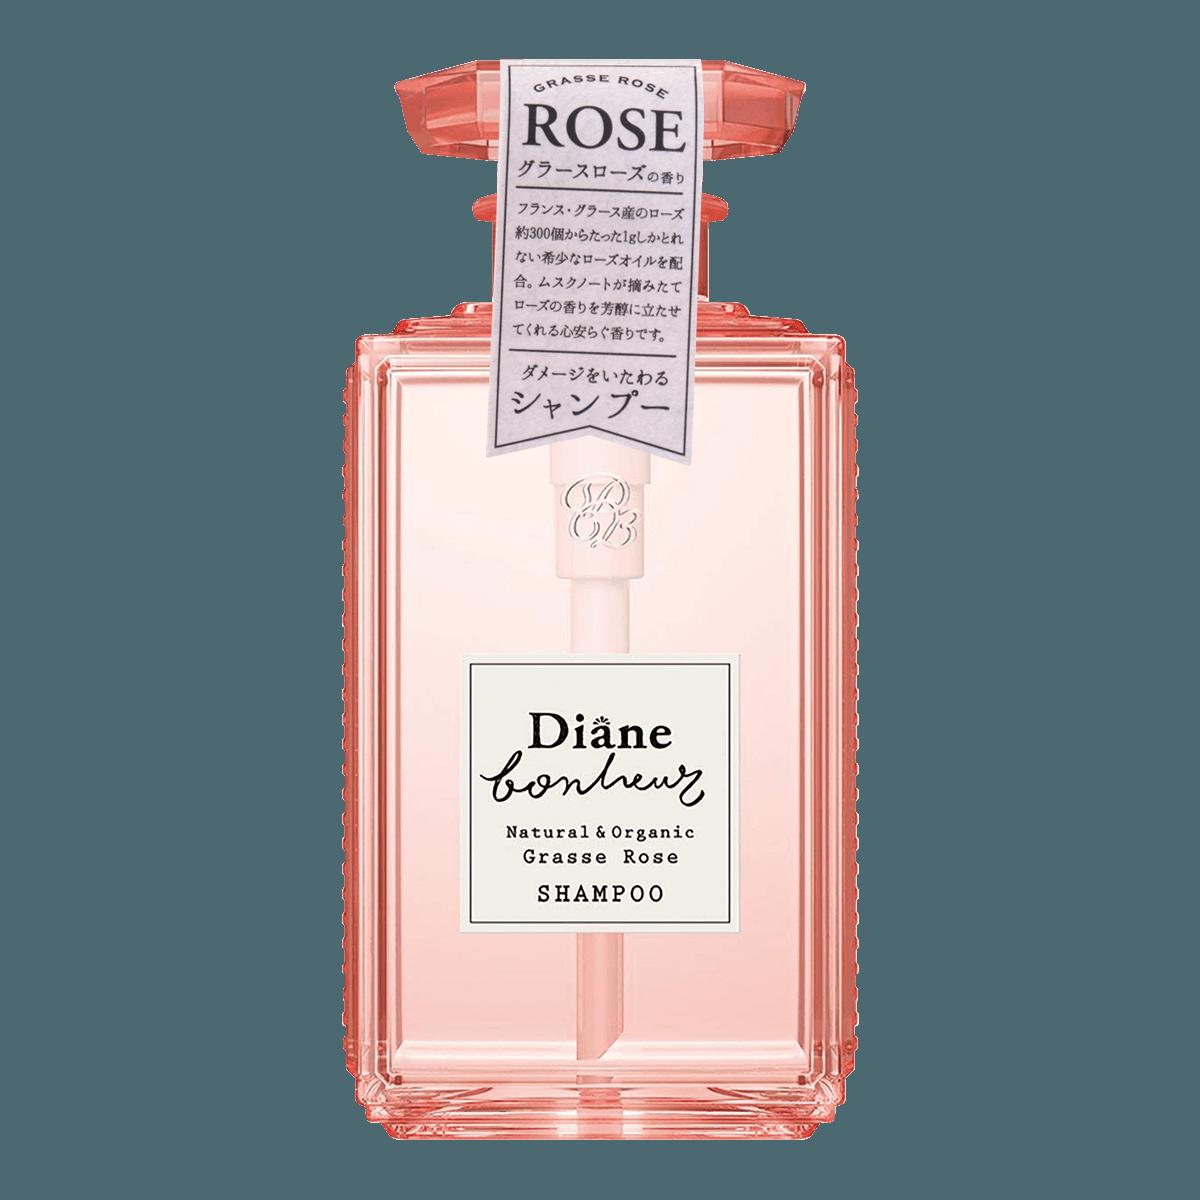 Yamibuy.com:Customer reviews:MOIST DIANE BONHEUR Natural & Organic Shampoo Grasse Rose 500ml